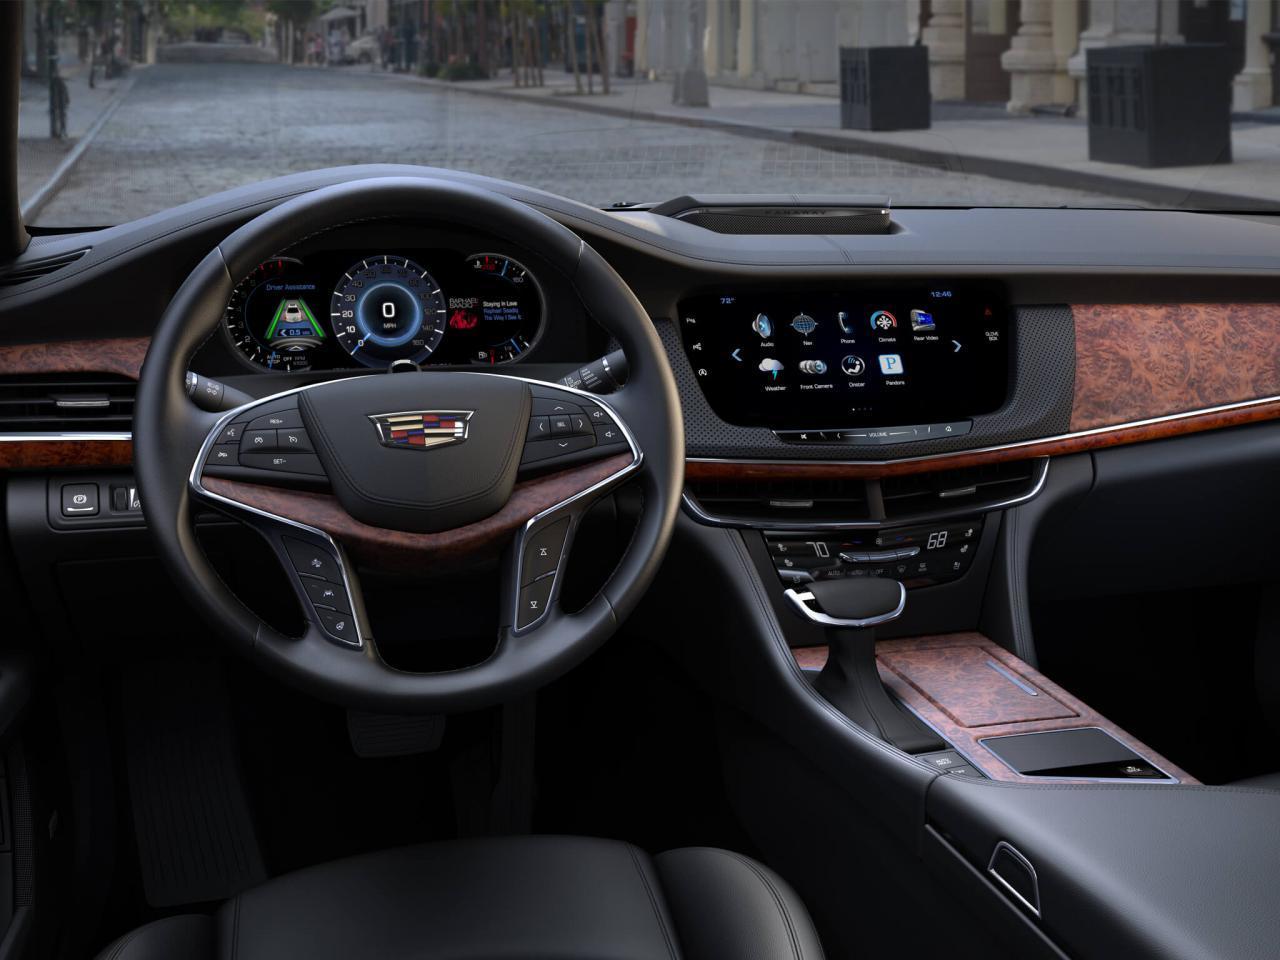 Cadillac-CT6-Interior_convert_20191129213918.jpg